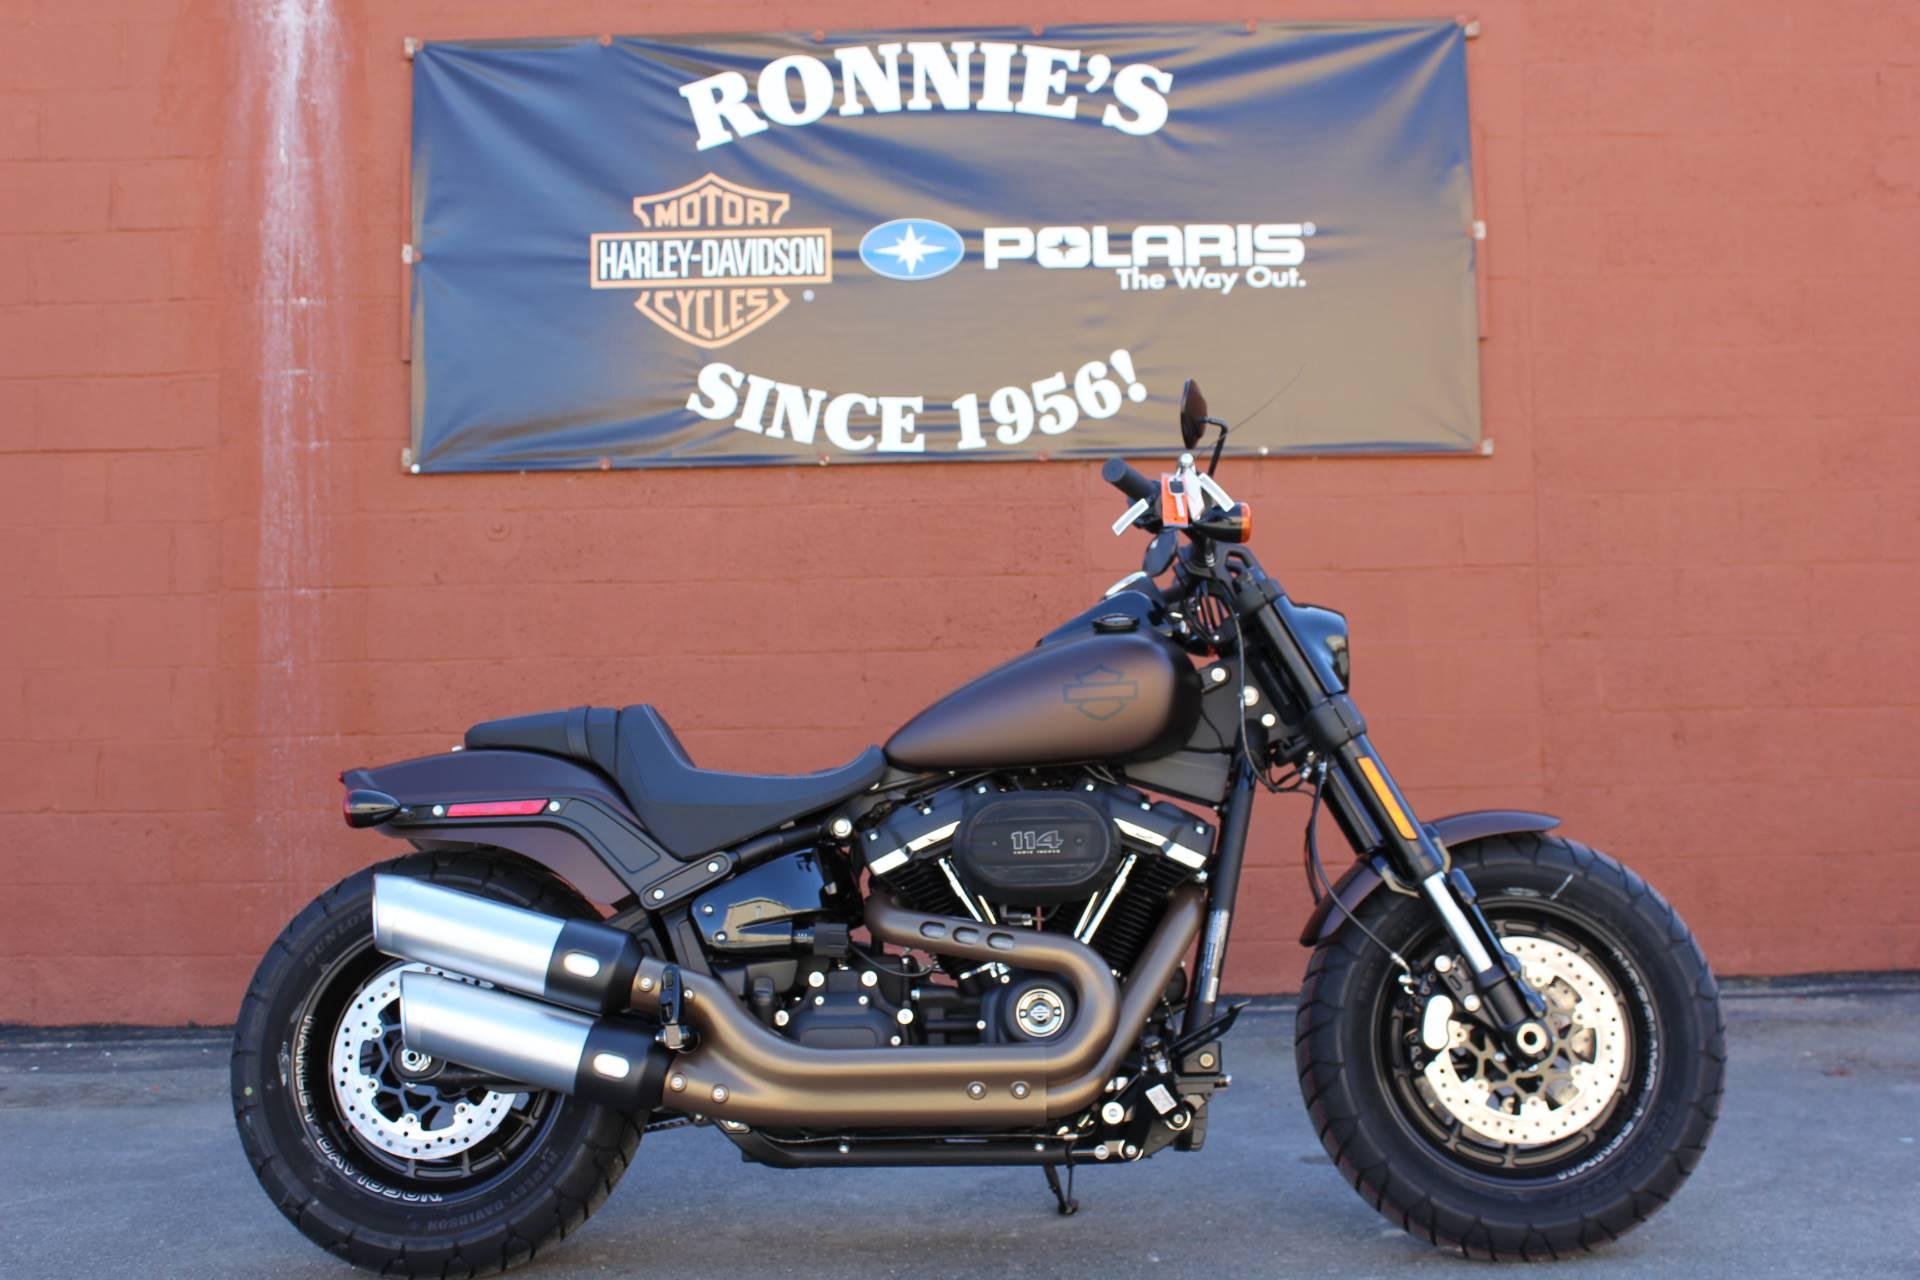 New 2019 Harley-Davidson Fat Bob® 114 Motorcycles in Pittsfield, MA